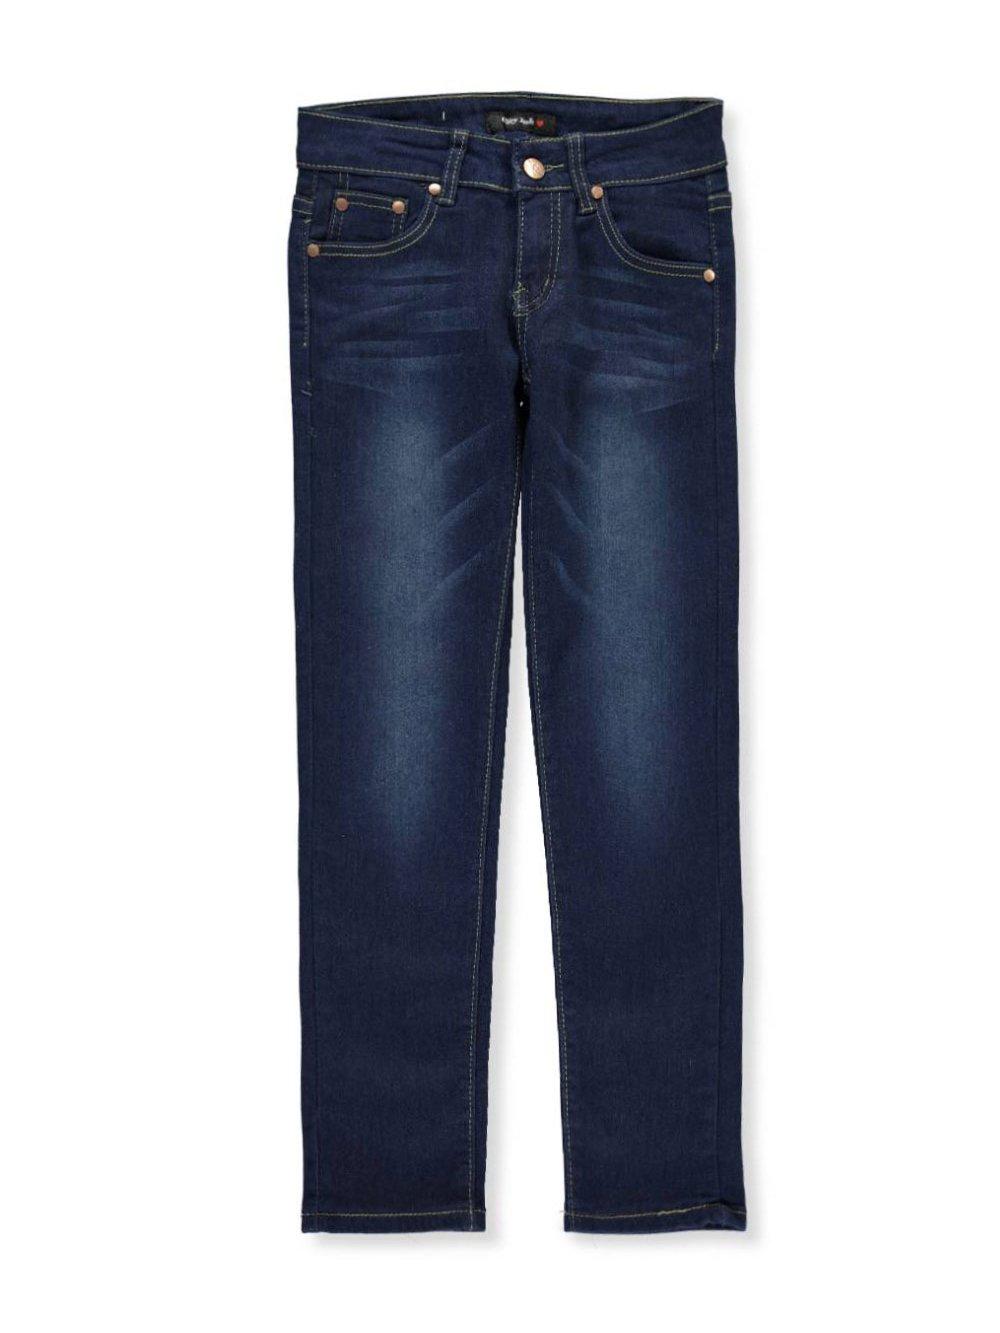 786a4a4f92 Jeans Kushiro City Slim Fit taille de Mens pantalon Chino